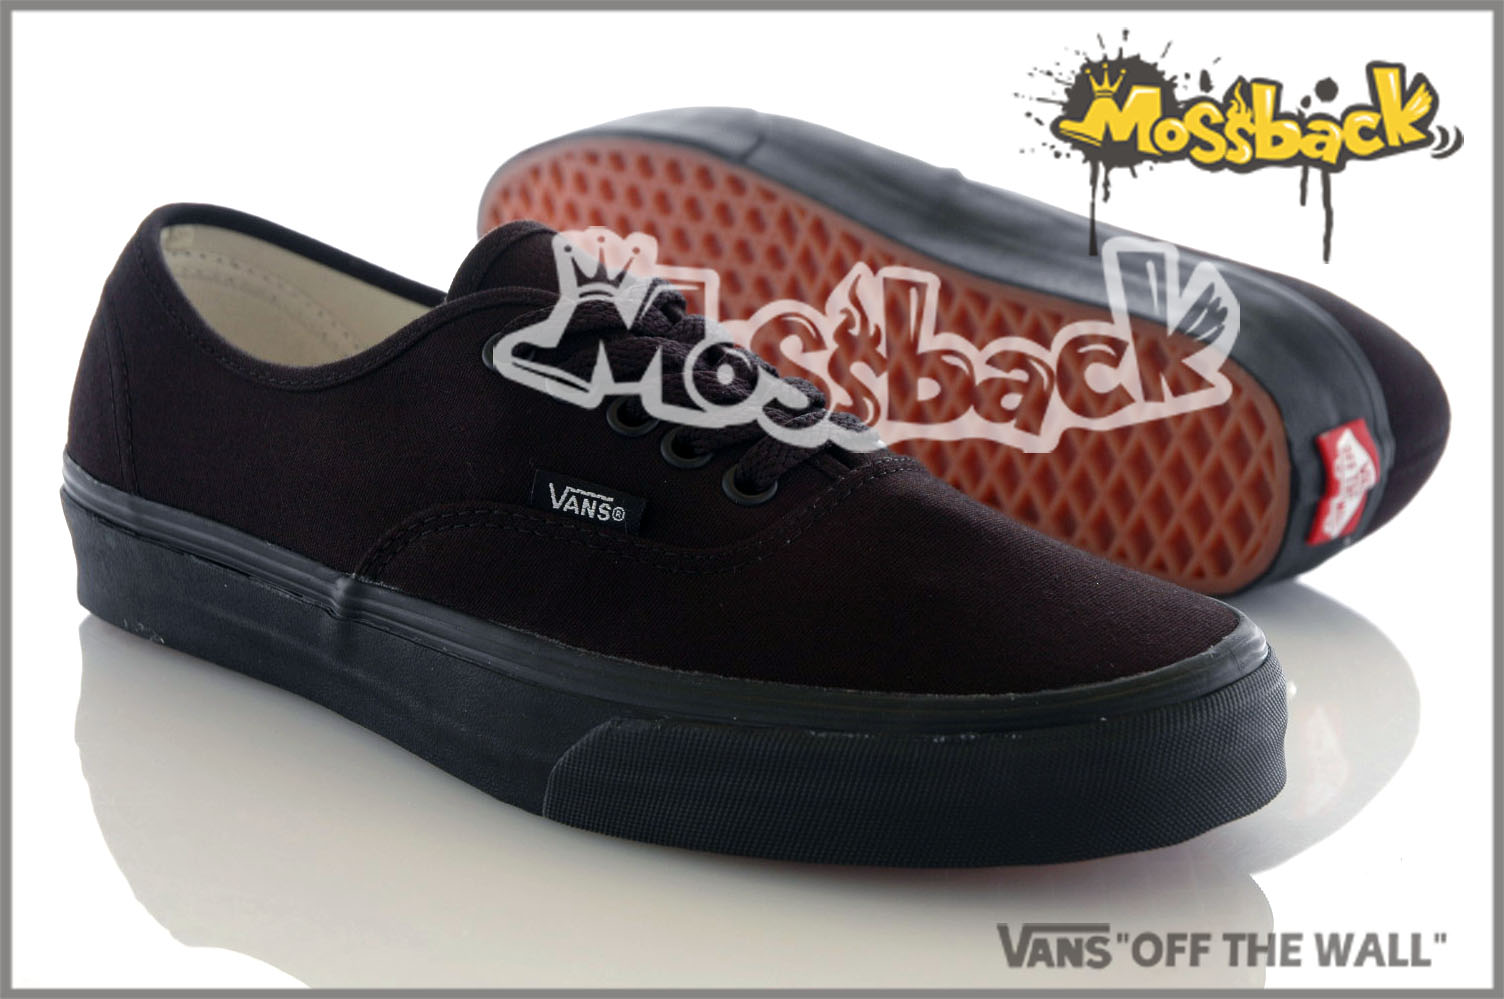 『Mossback』VANS ATHENTIC 懶人鞋 復古 基本款 百搭 紅標 全黑NO:C010111